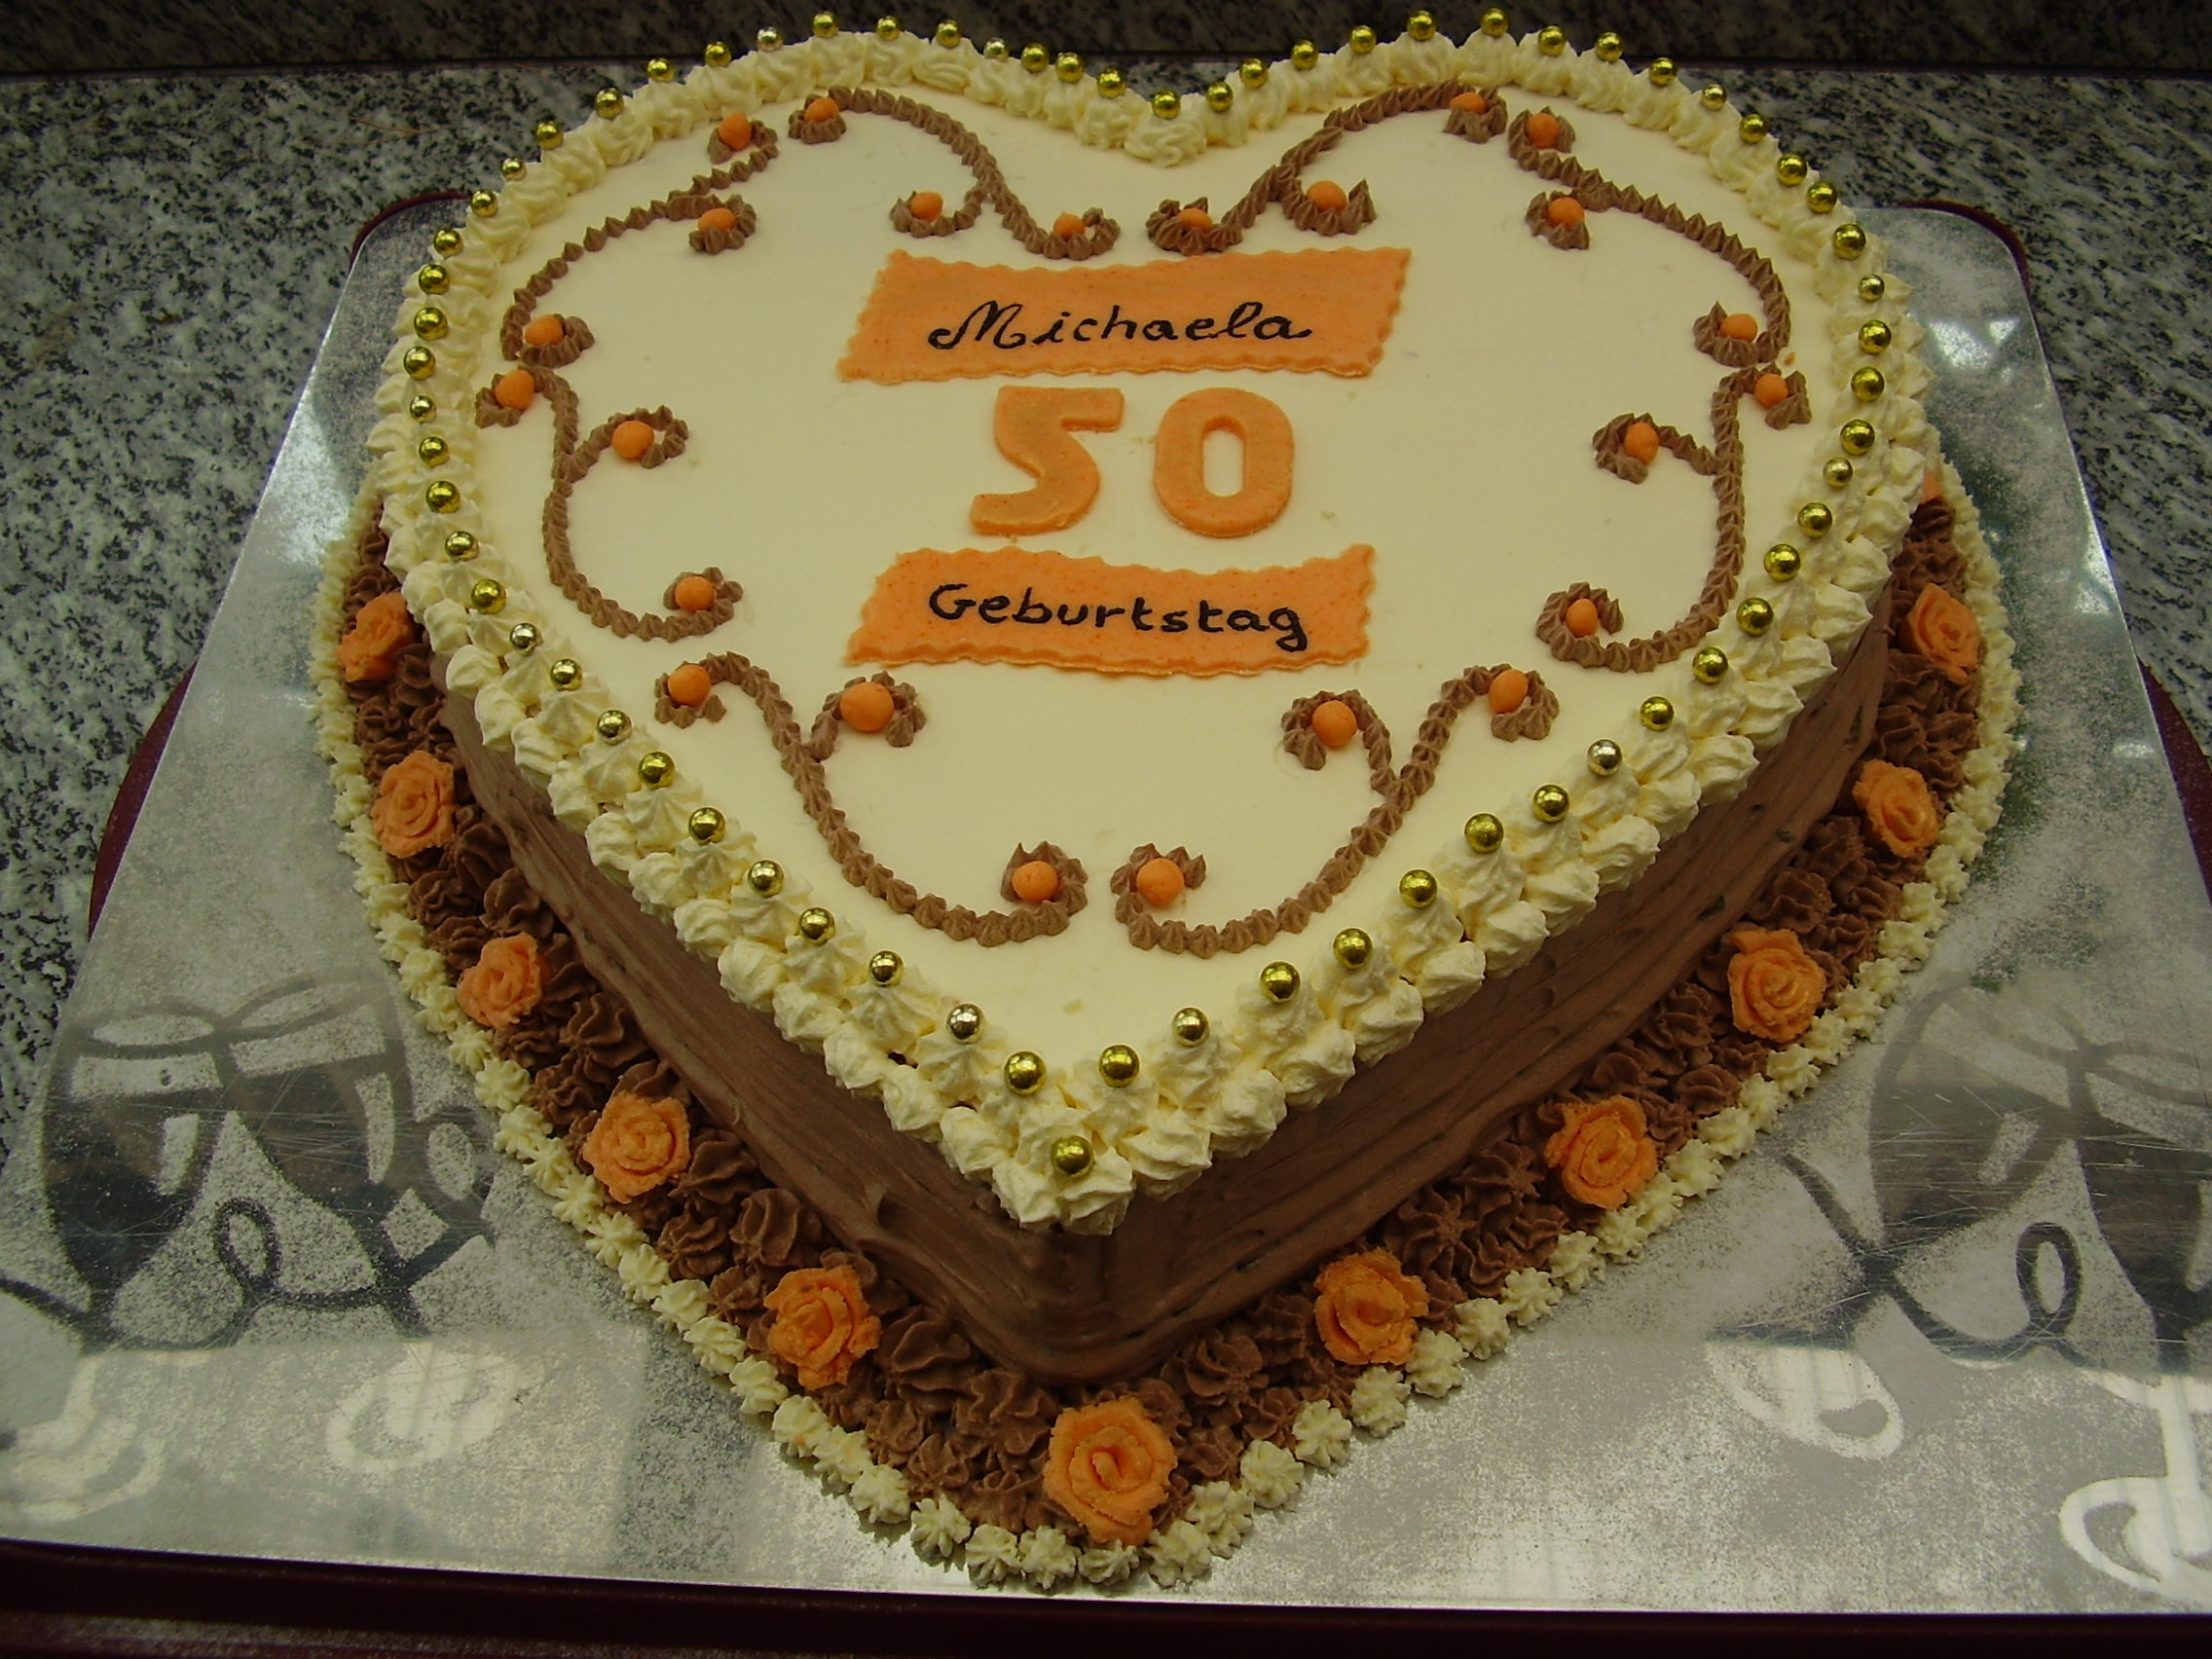 Geburtstagstorte 50 Geburtstag  Geburtstag Erwachsene Geburtstagstorte zum 50 in Herzform